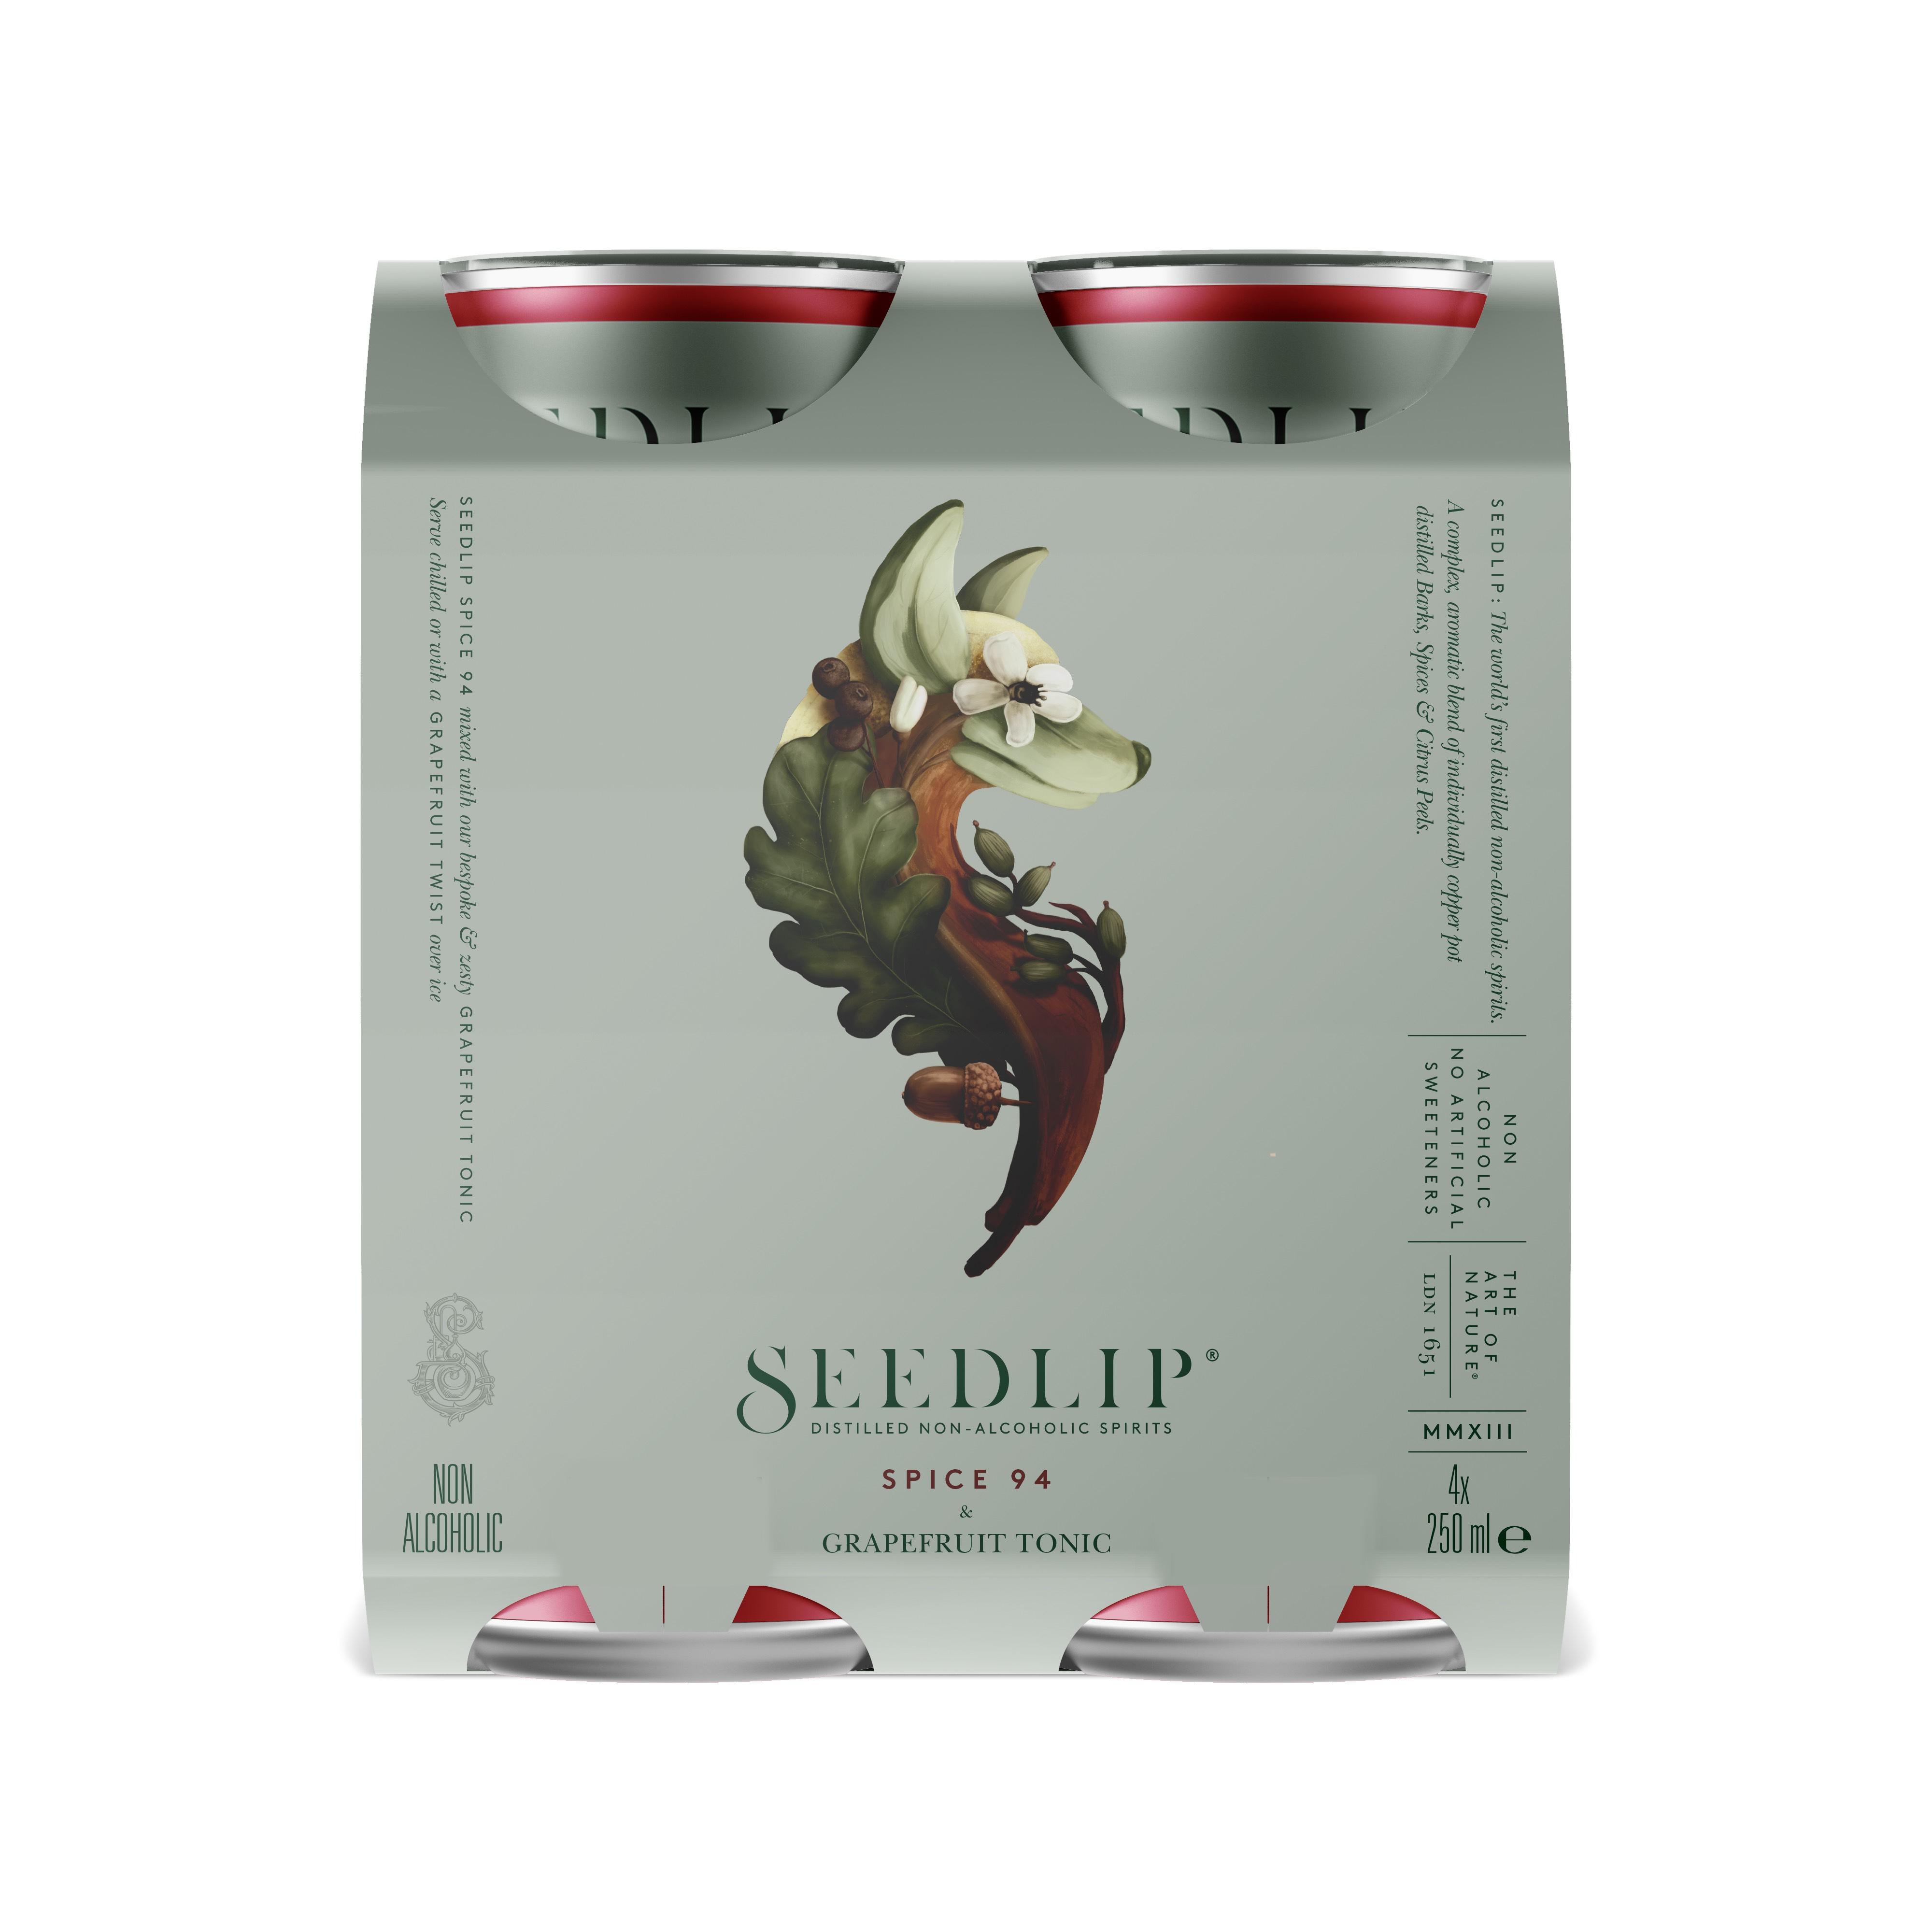 Seedlip Spice 94 & Grapefruit Tonic 4 pack £1 (£2.50 delivery / Short Expiry) @ Seedlip